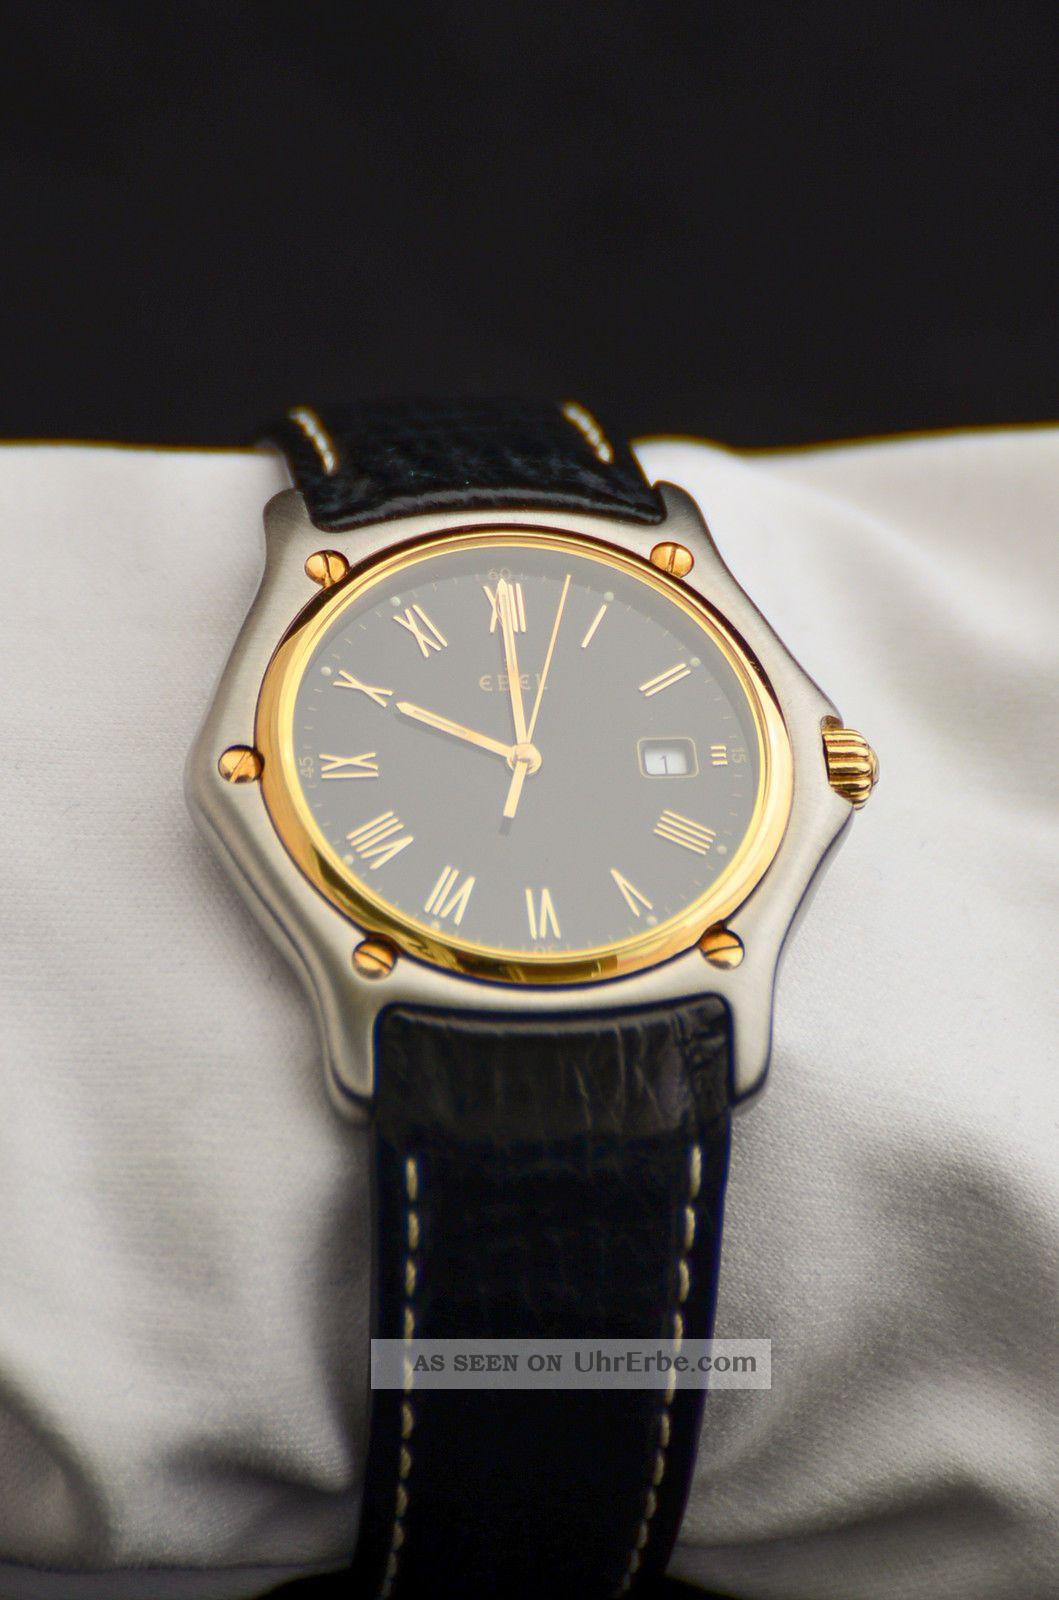 Ebel 1911 Lady 18 K Gold Bezel Swiss Mit Faltschliesse Armbanduhren Bild